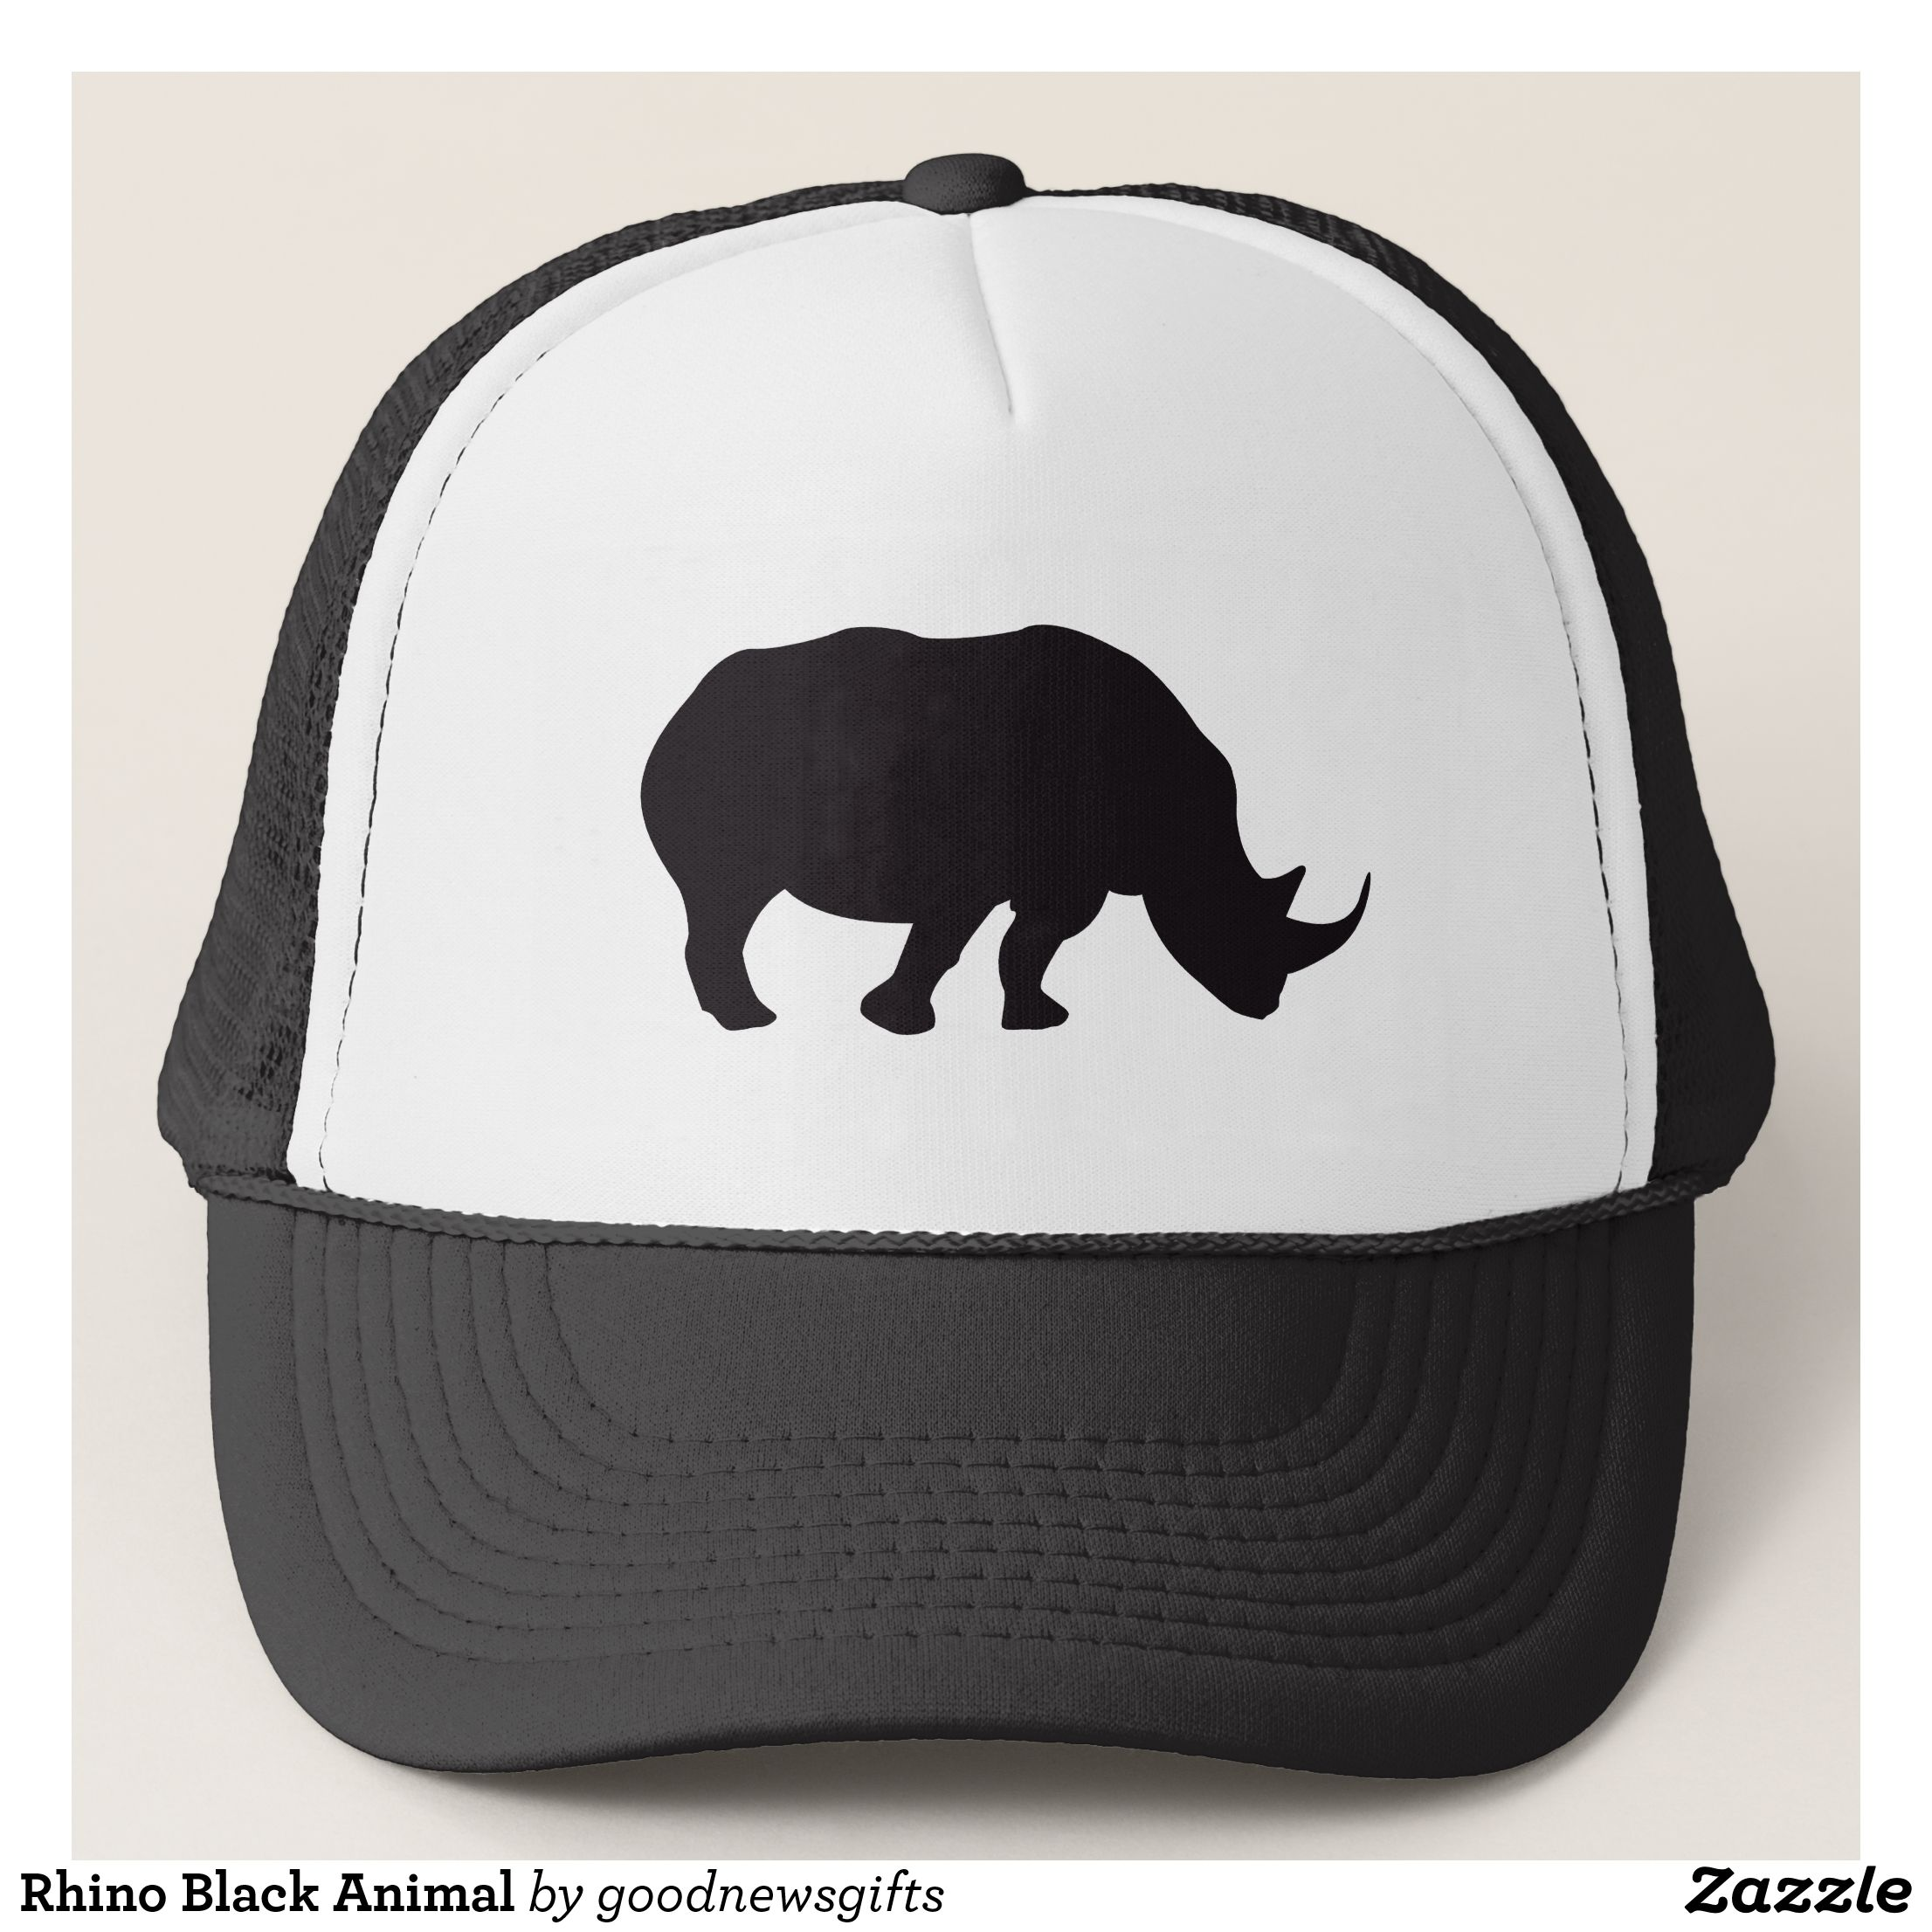 Rhino Black Animal Trucker Hat Zazzle Com With Images Black Animals Trucker Hat Hats